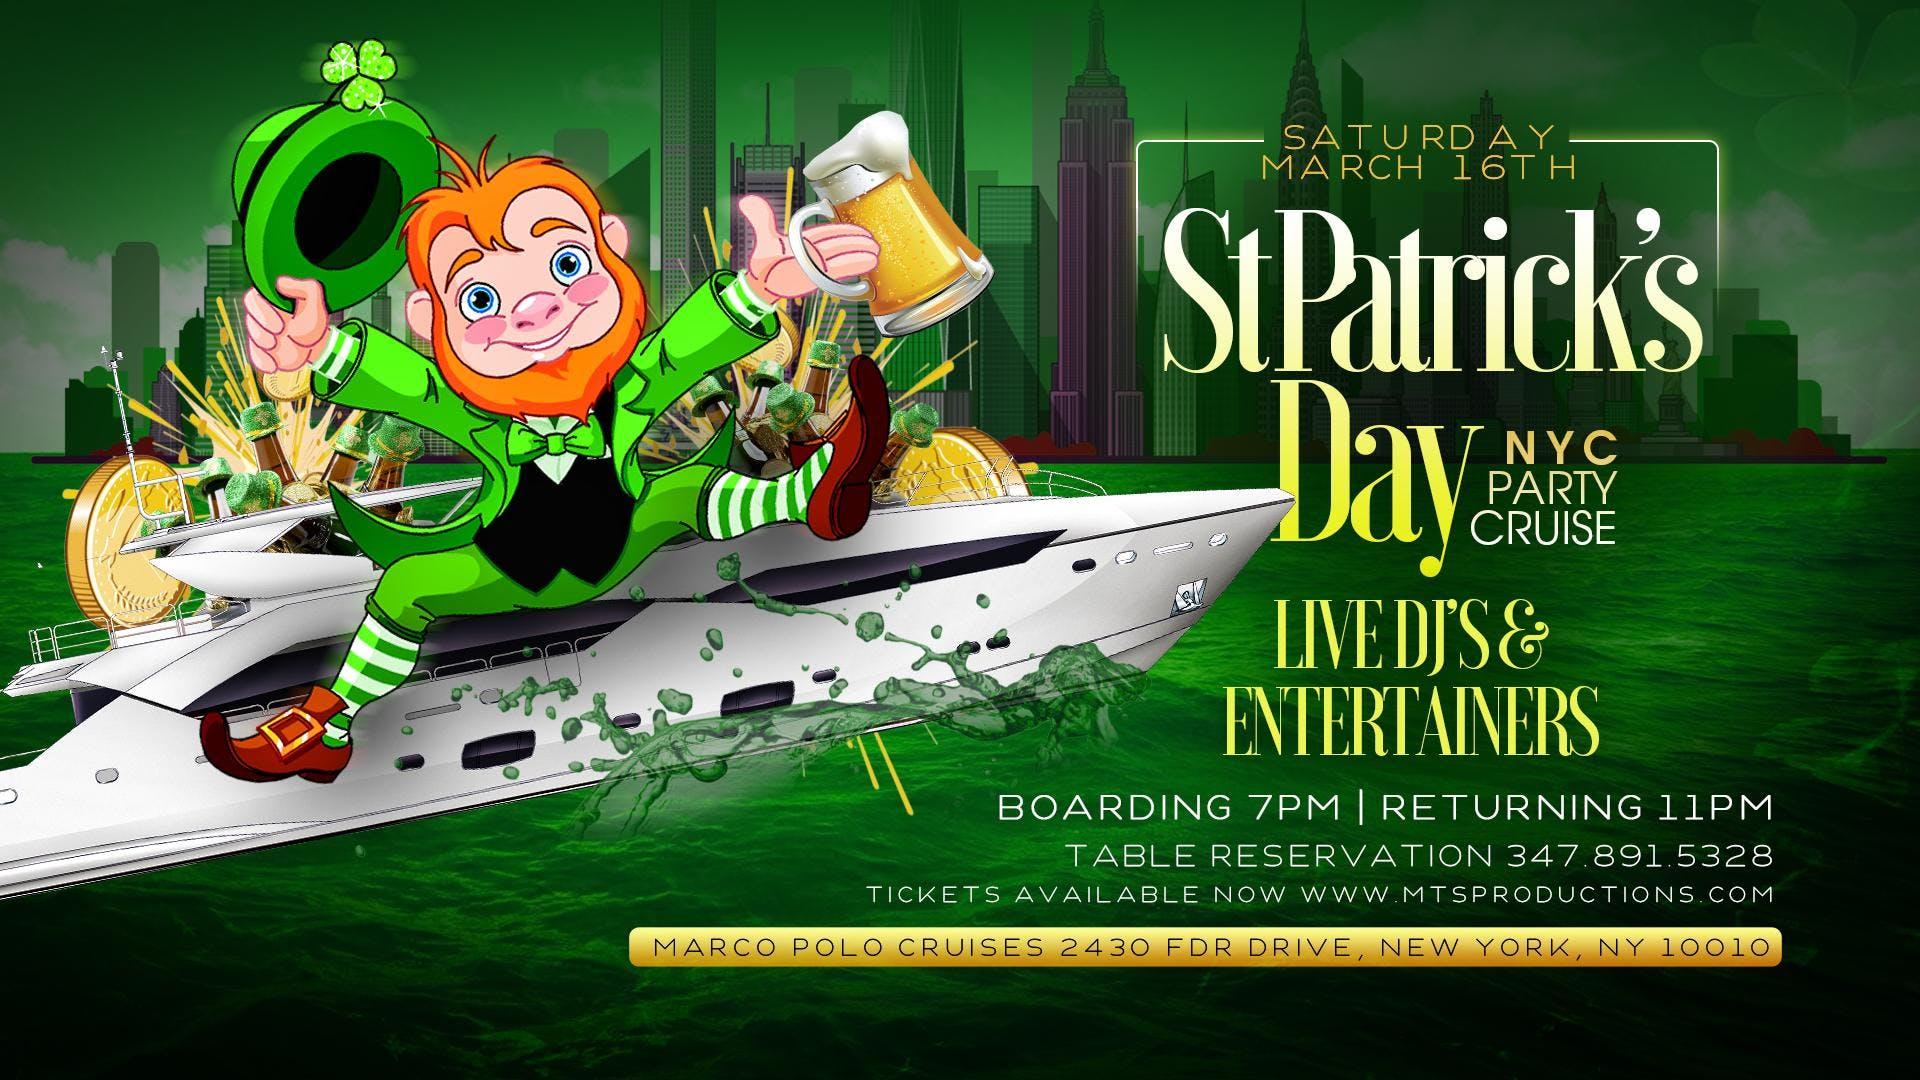 St Patrick's Day NYC Booze Cruise